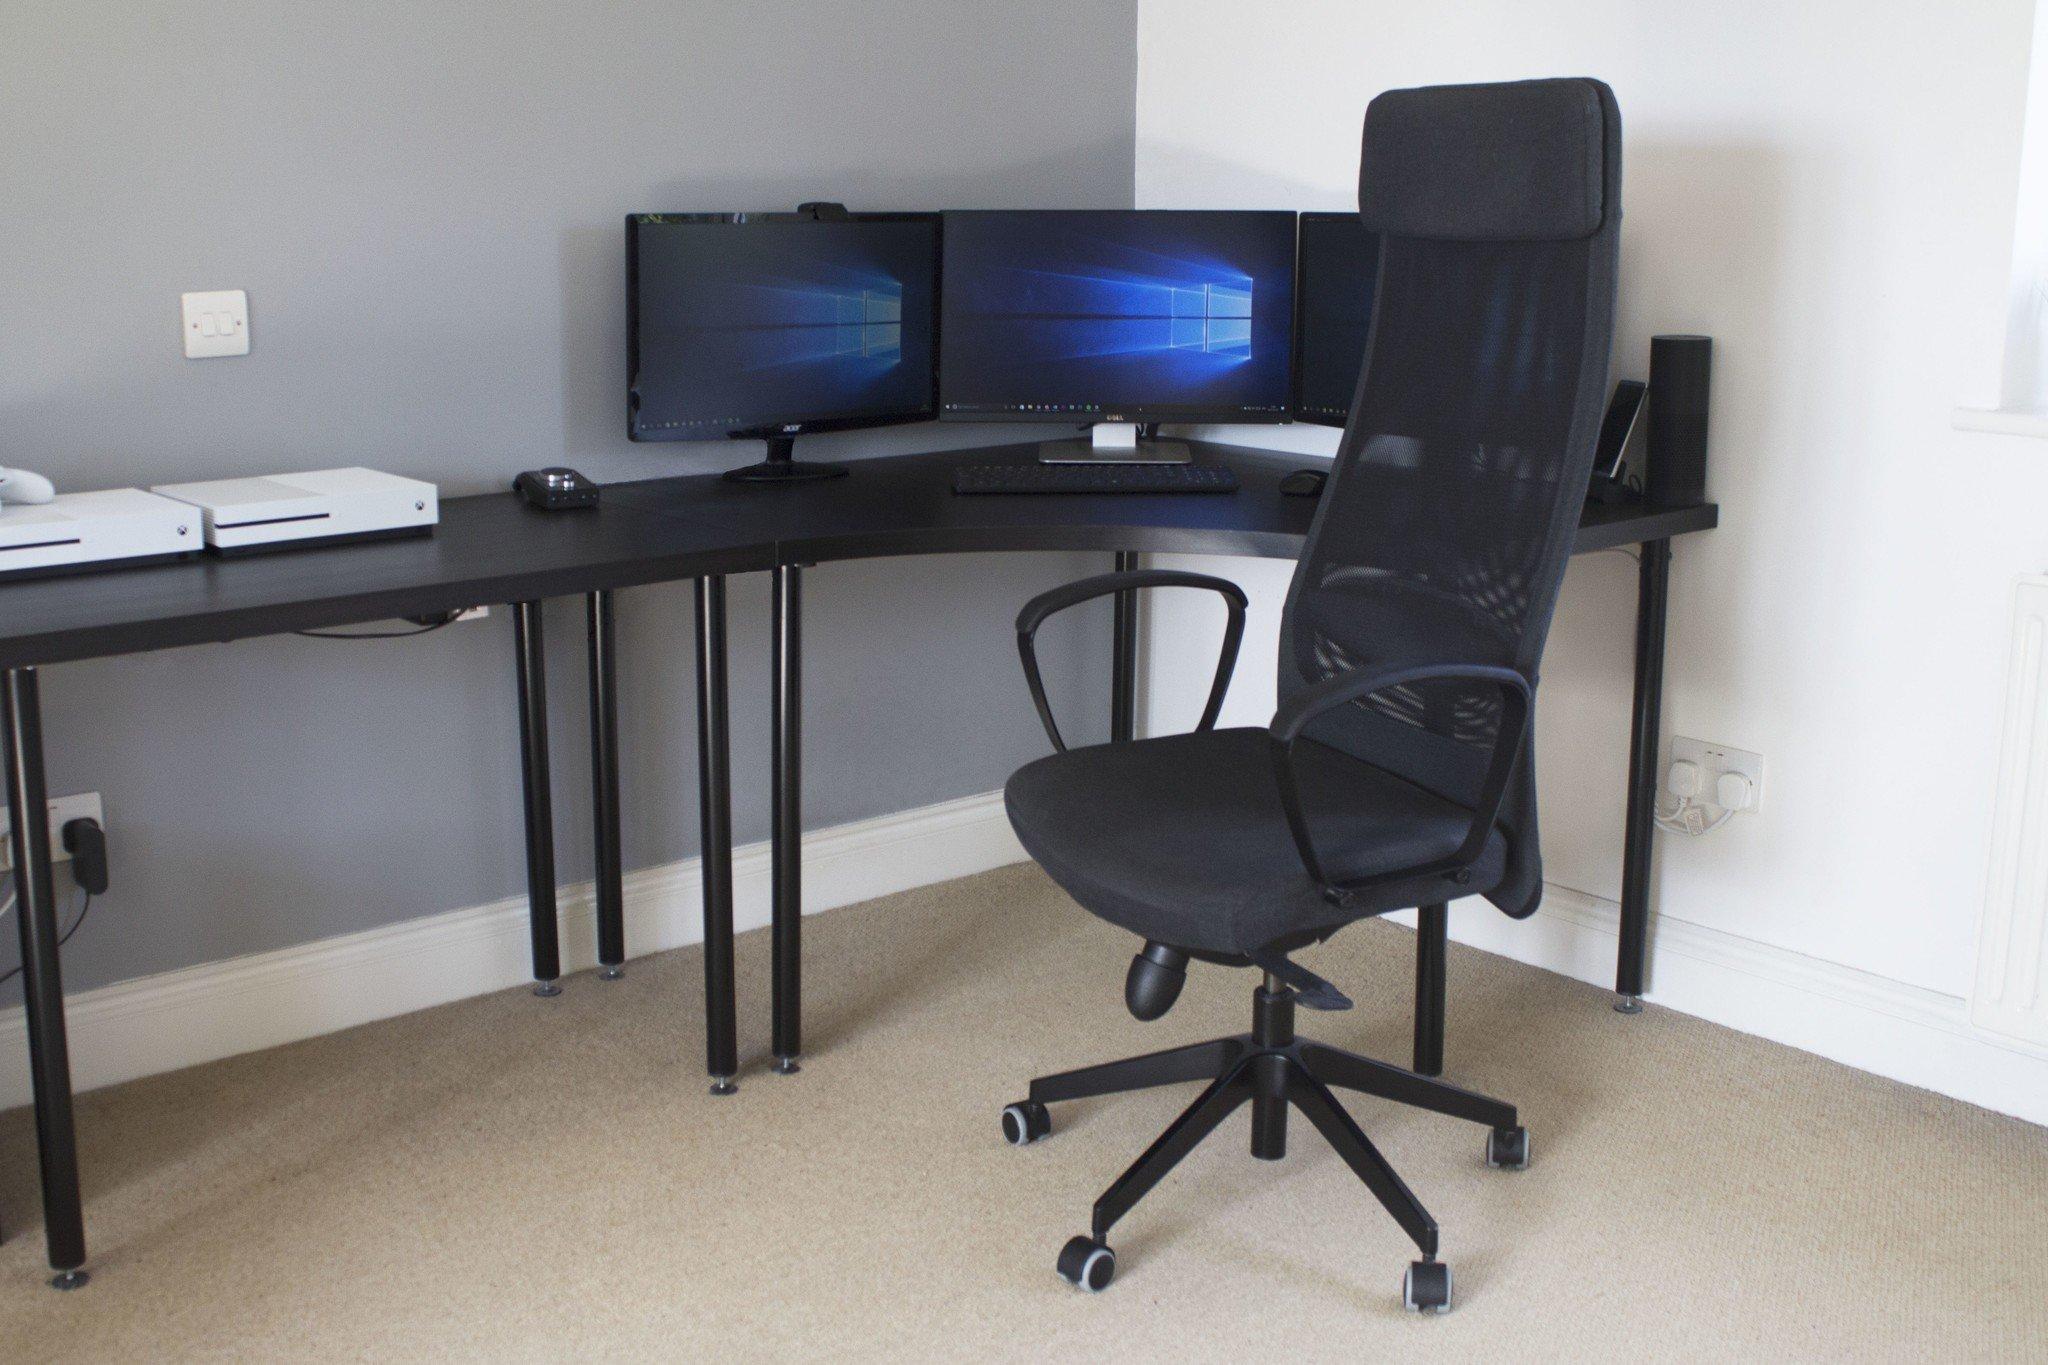 Best Office Chairs Under 200  Windows Central